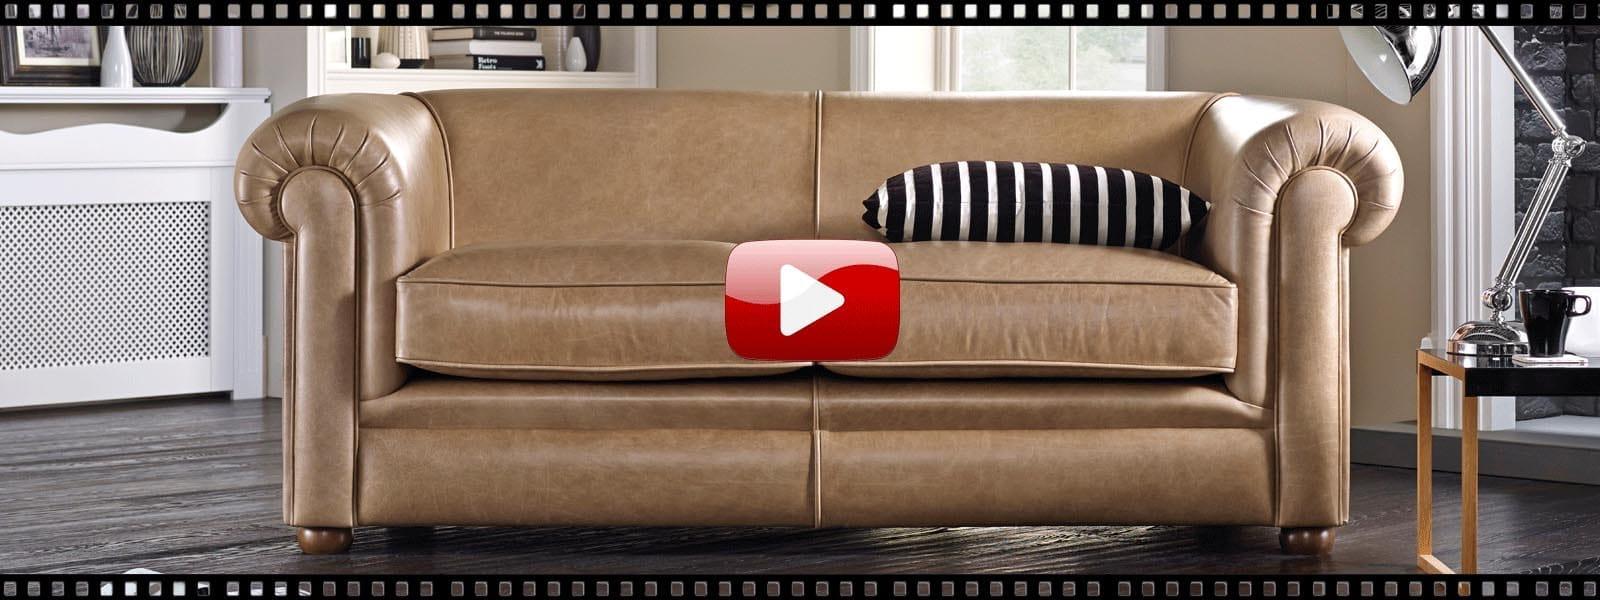 hampton 3 seater sofa from sofas by saxon uk hampton chester